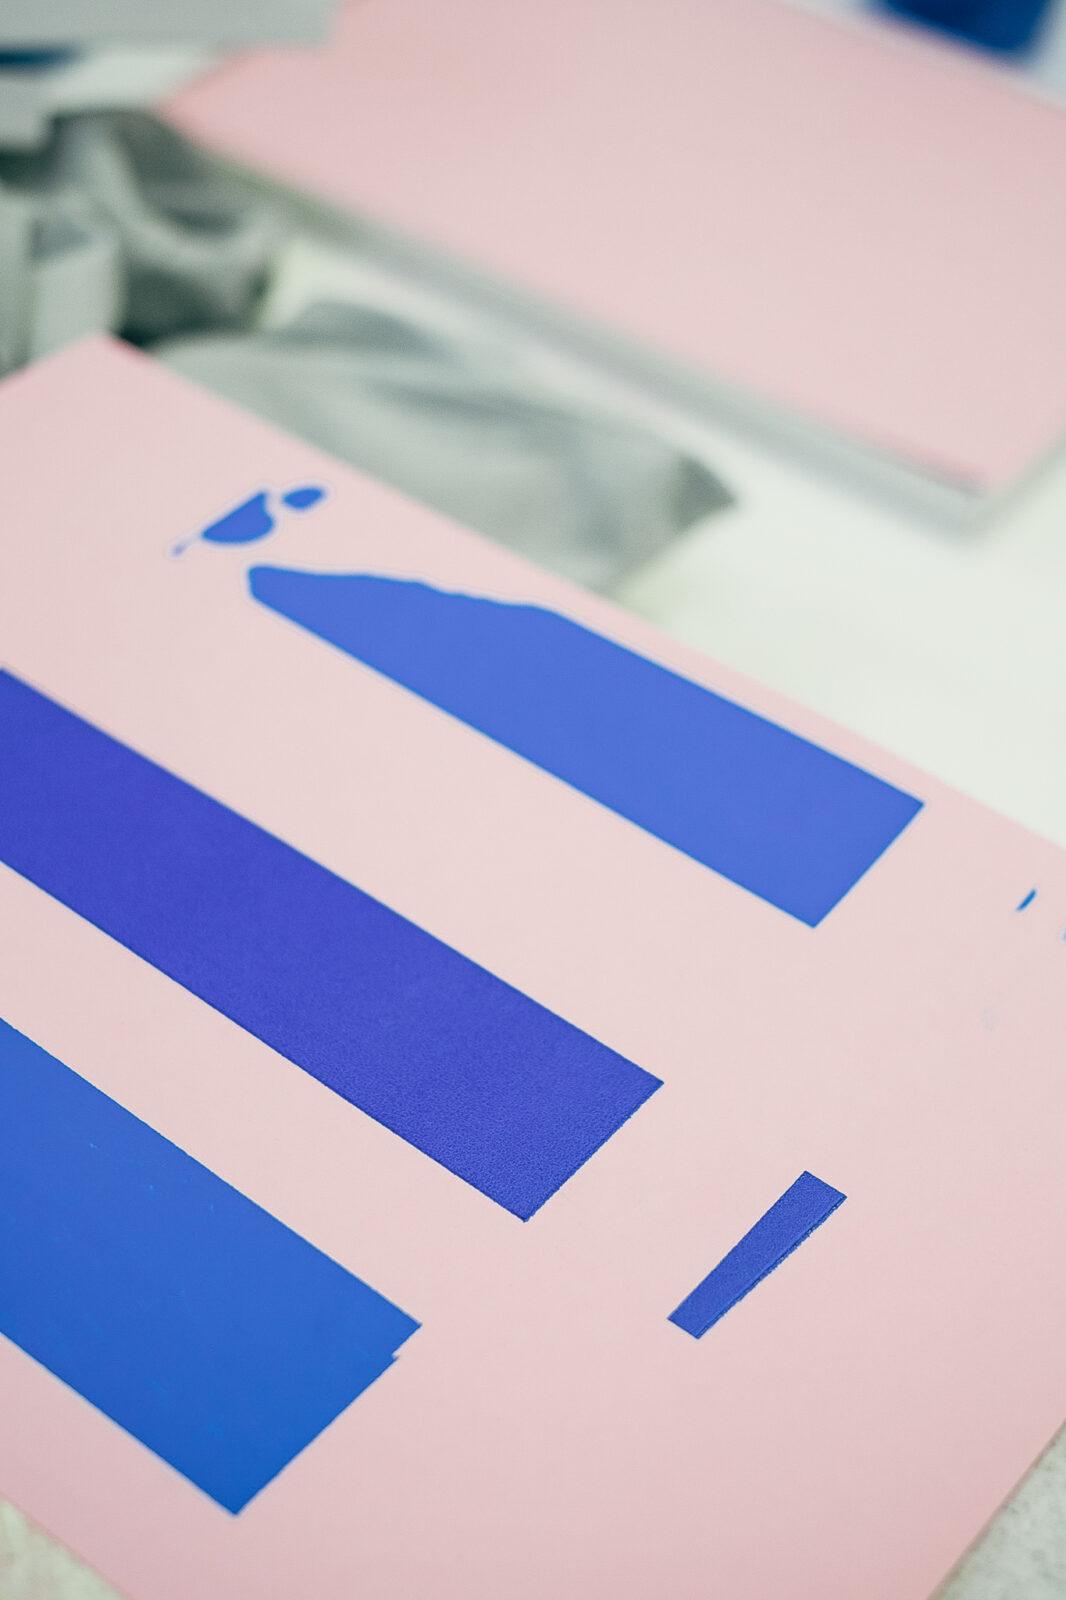 Mach doch watte wills lettering special edition art print kunstdruck poster interior